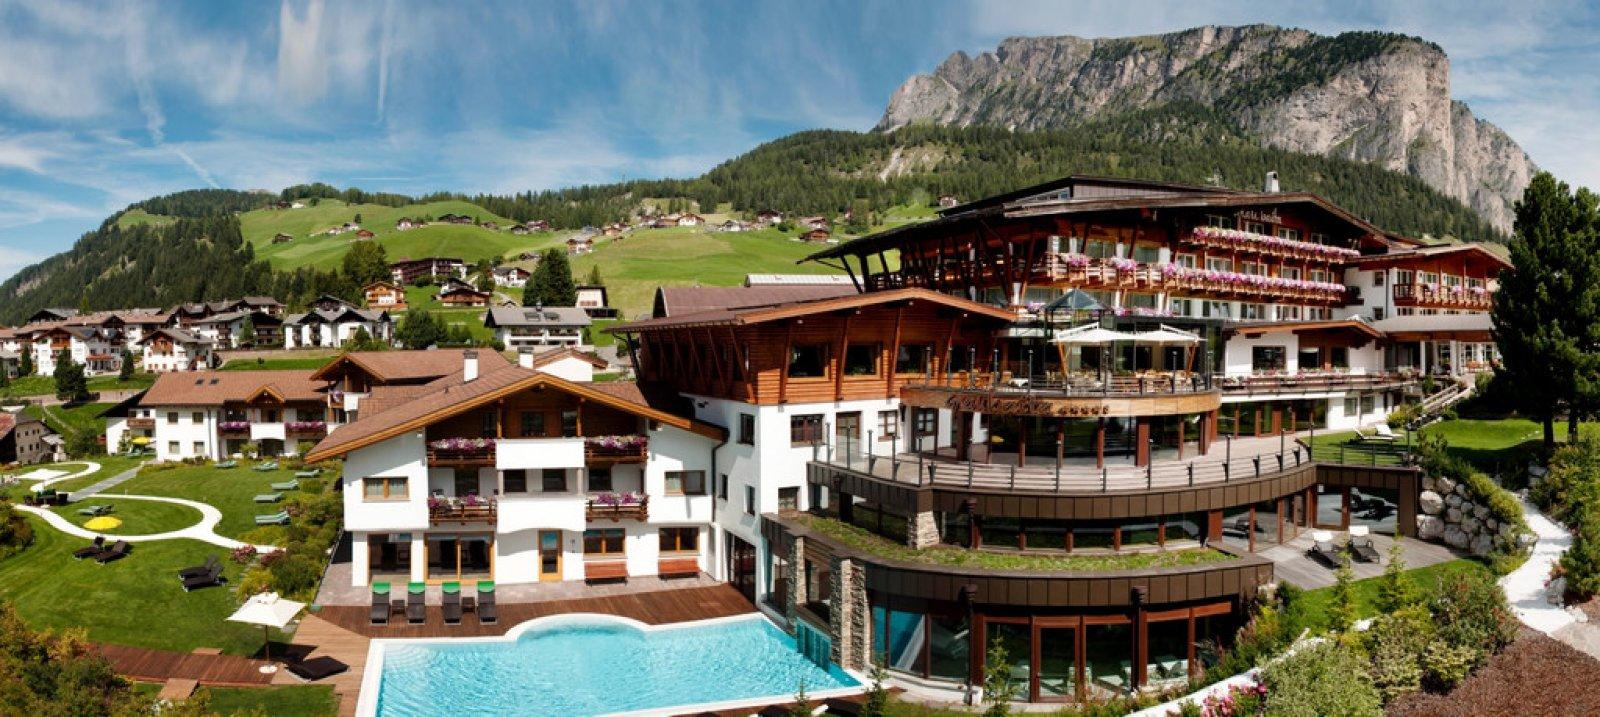 Val Gardena Hotel Spa